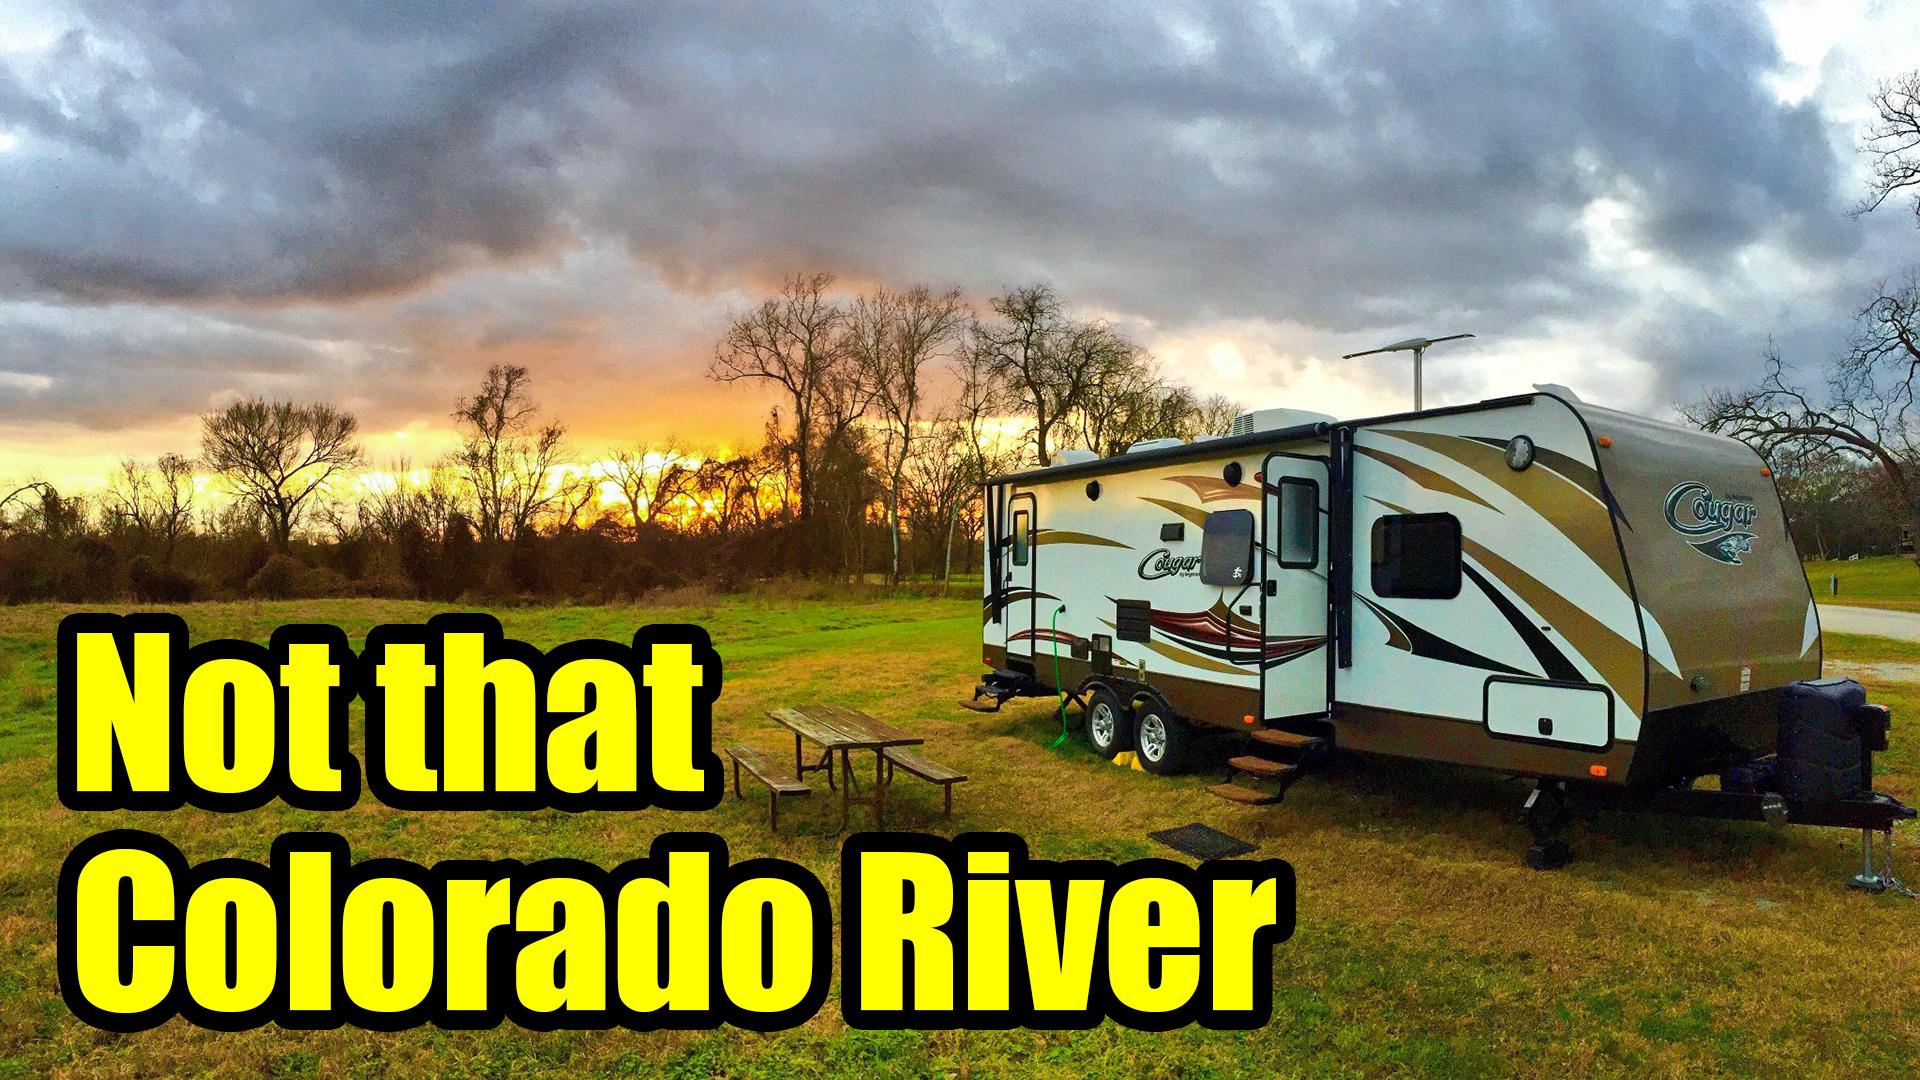 ColoradoRiver